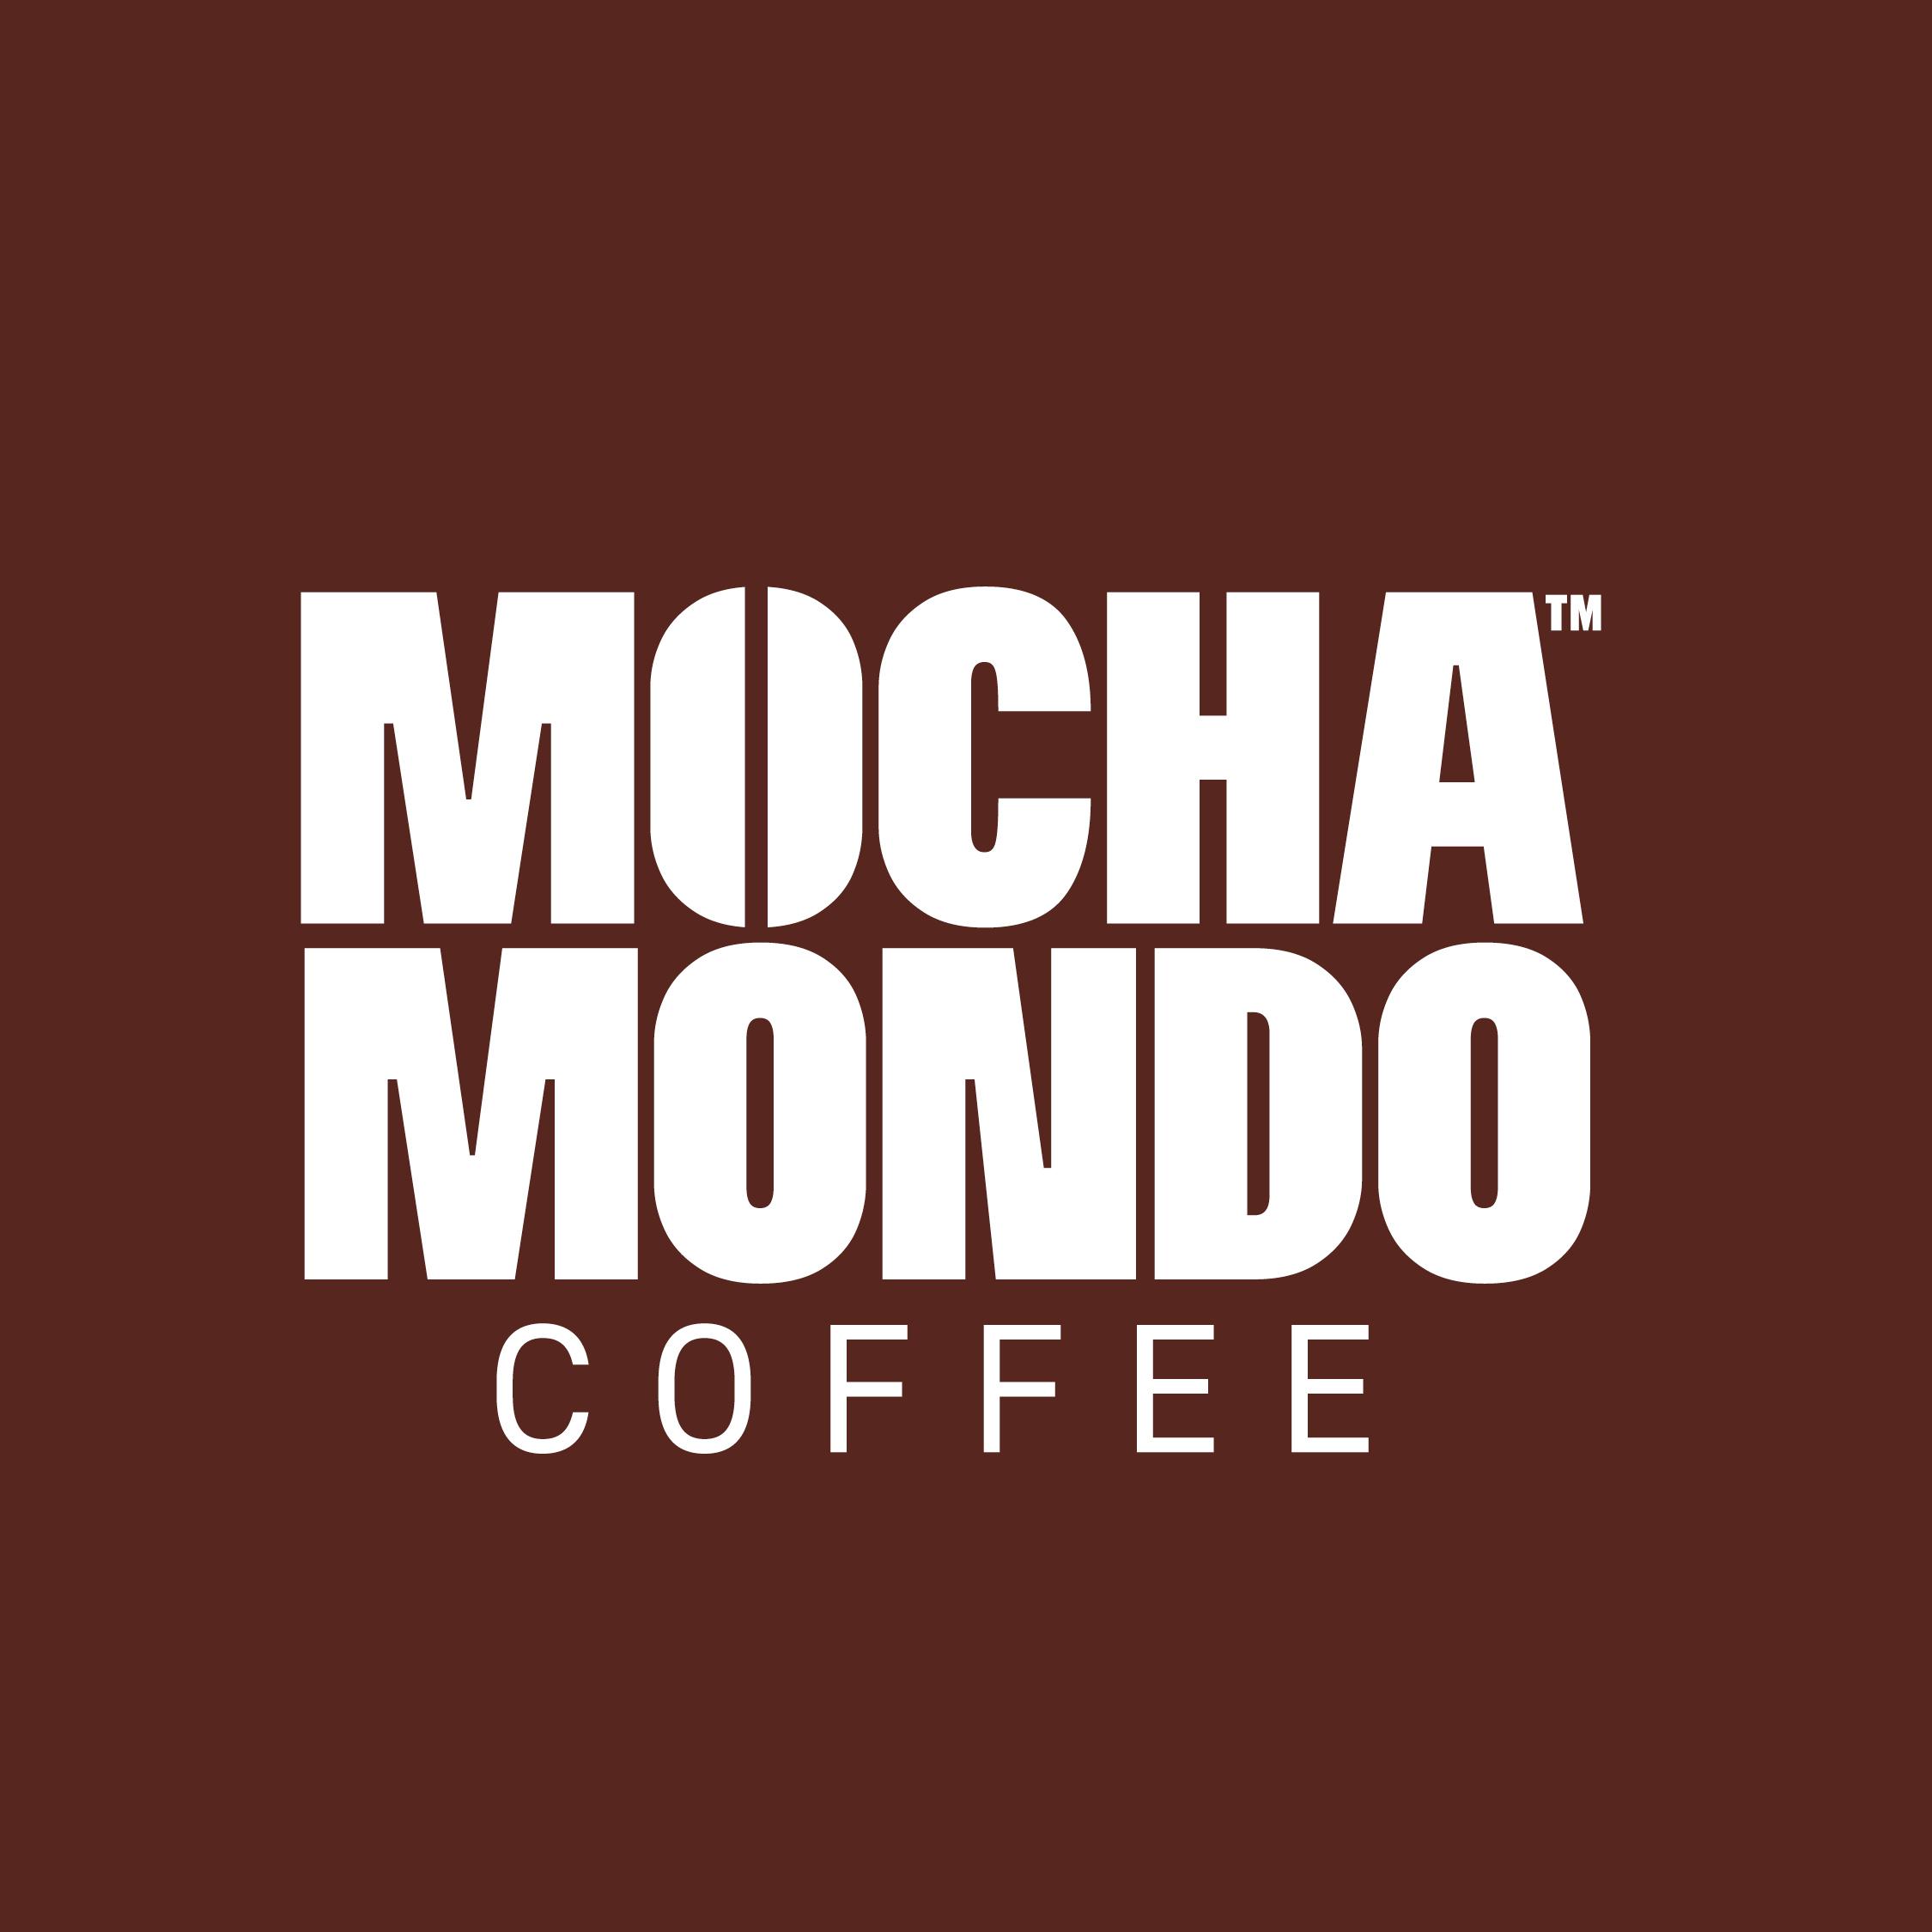 Mocha Mondo Coffee Image